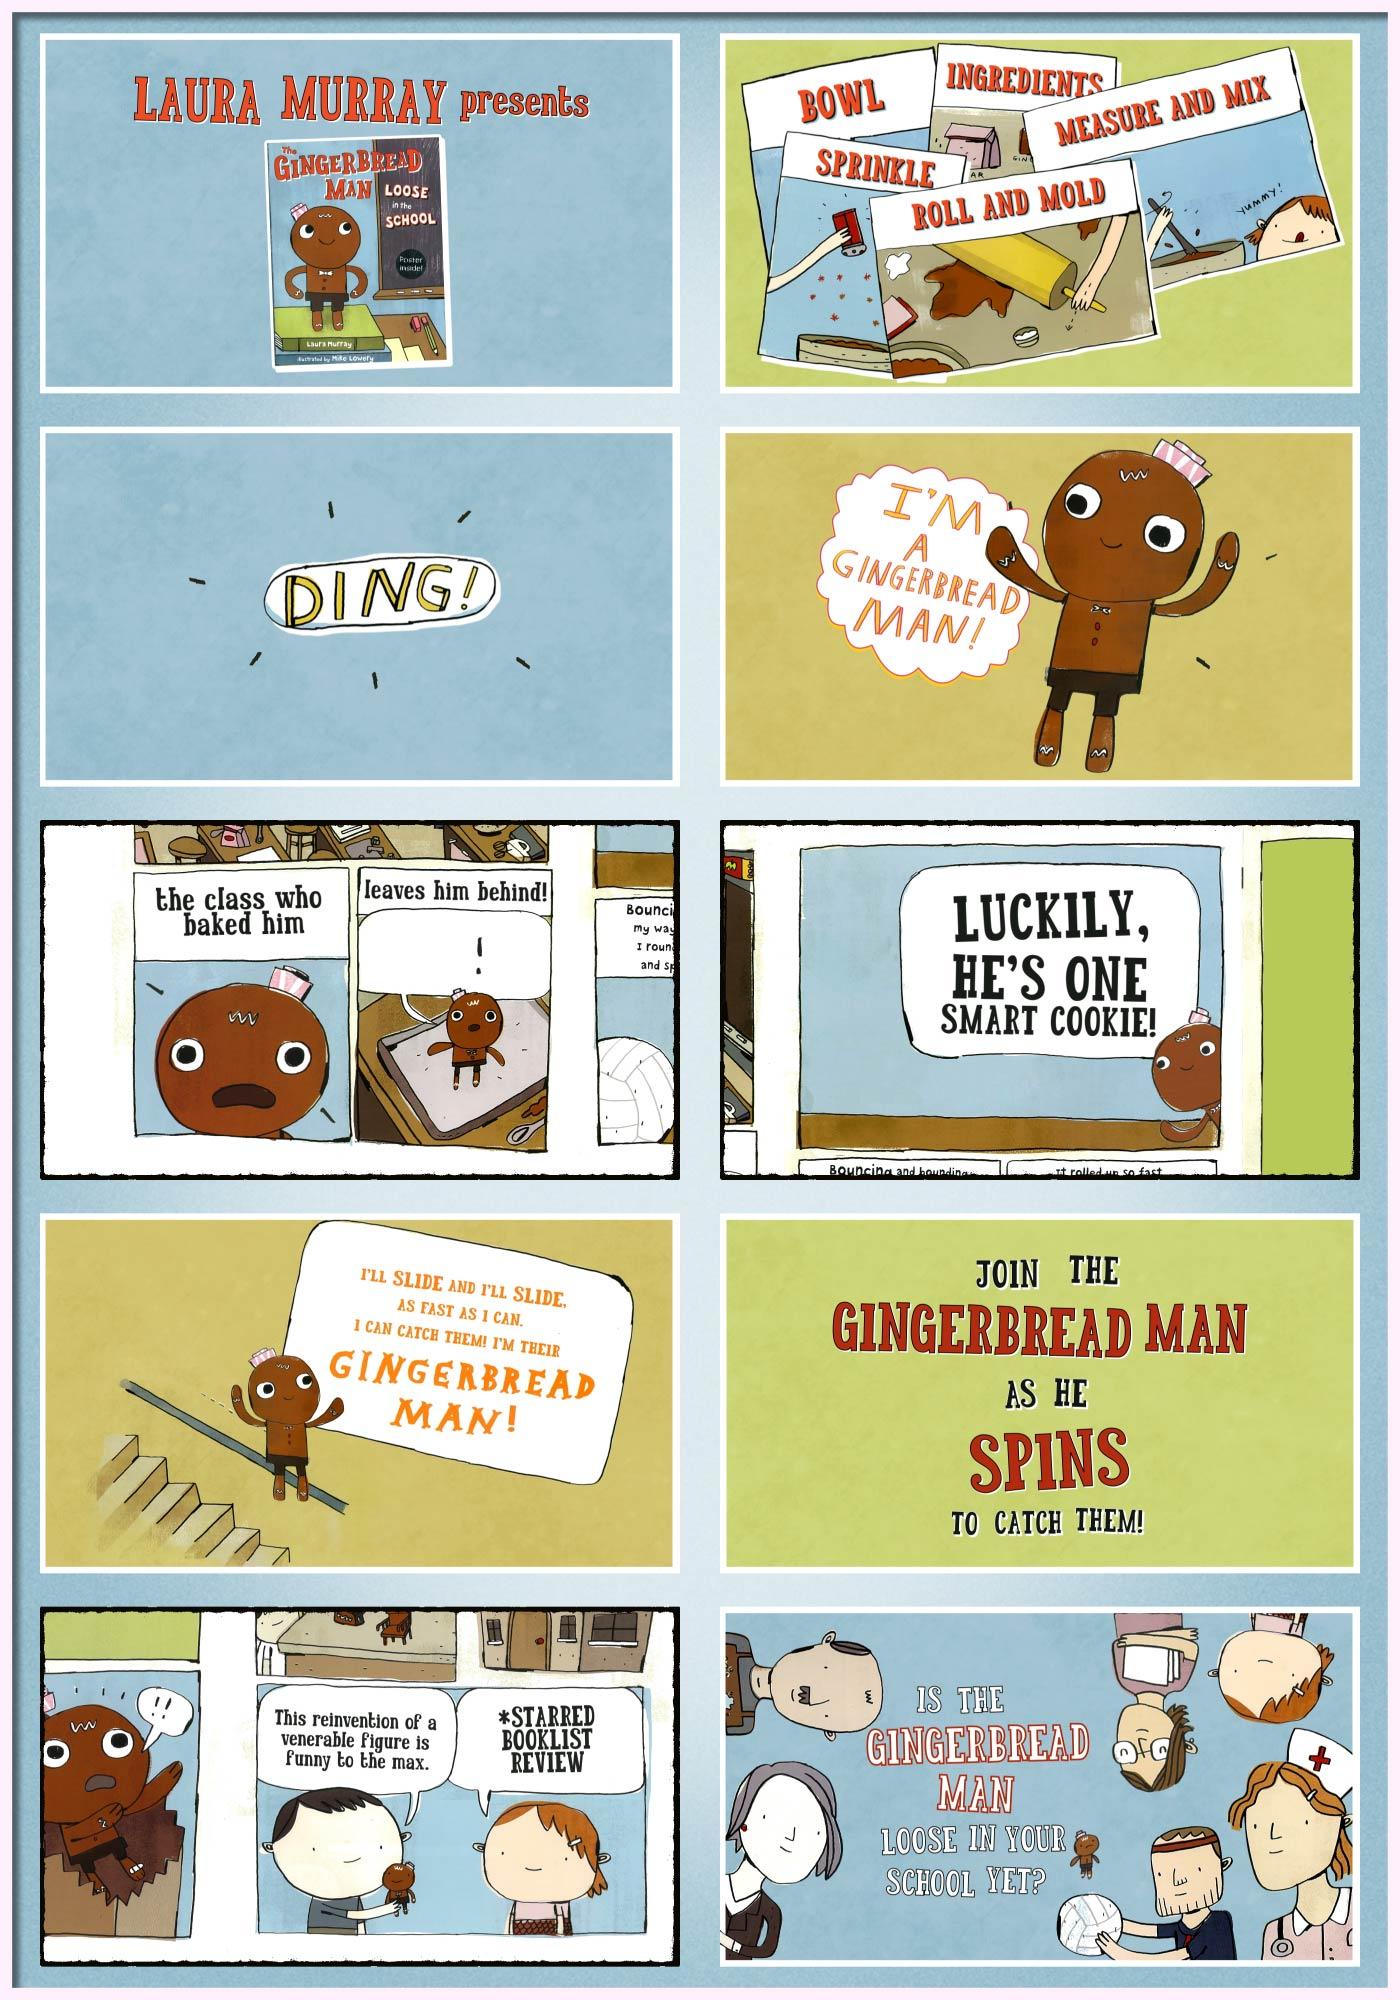 Gingerbread Man Book The gingerbread man loose